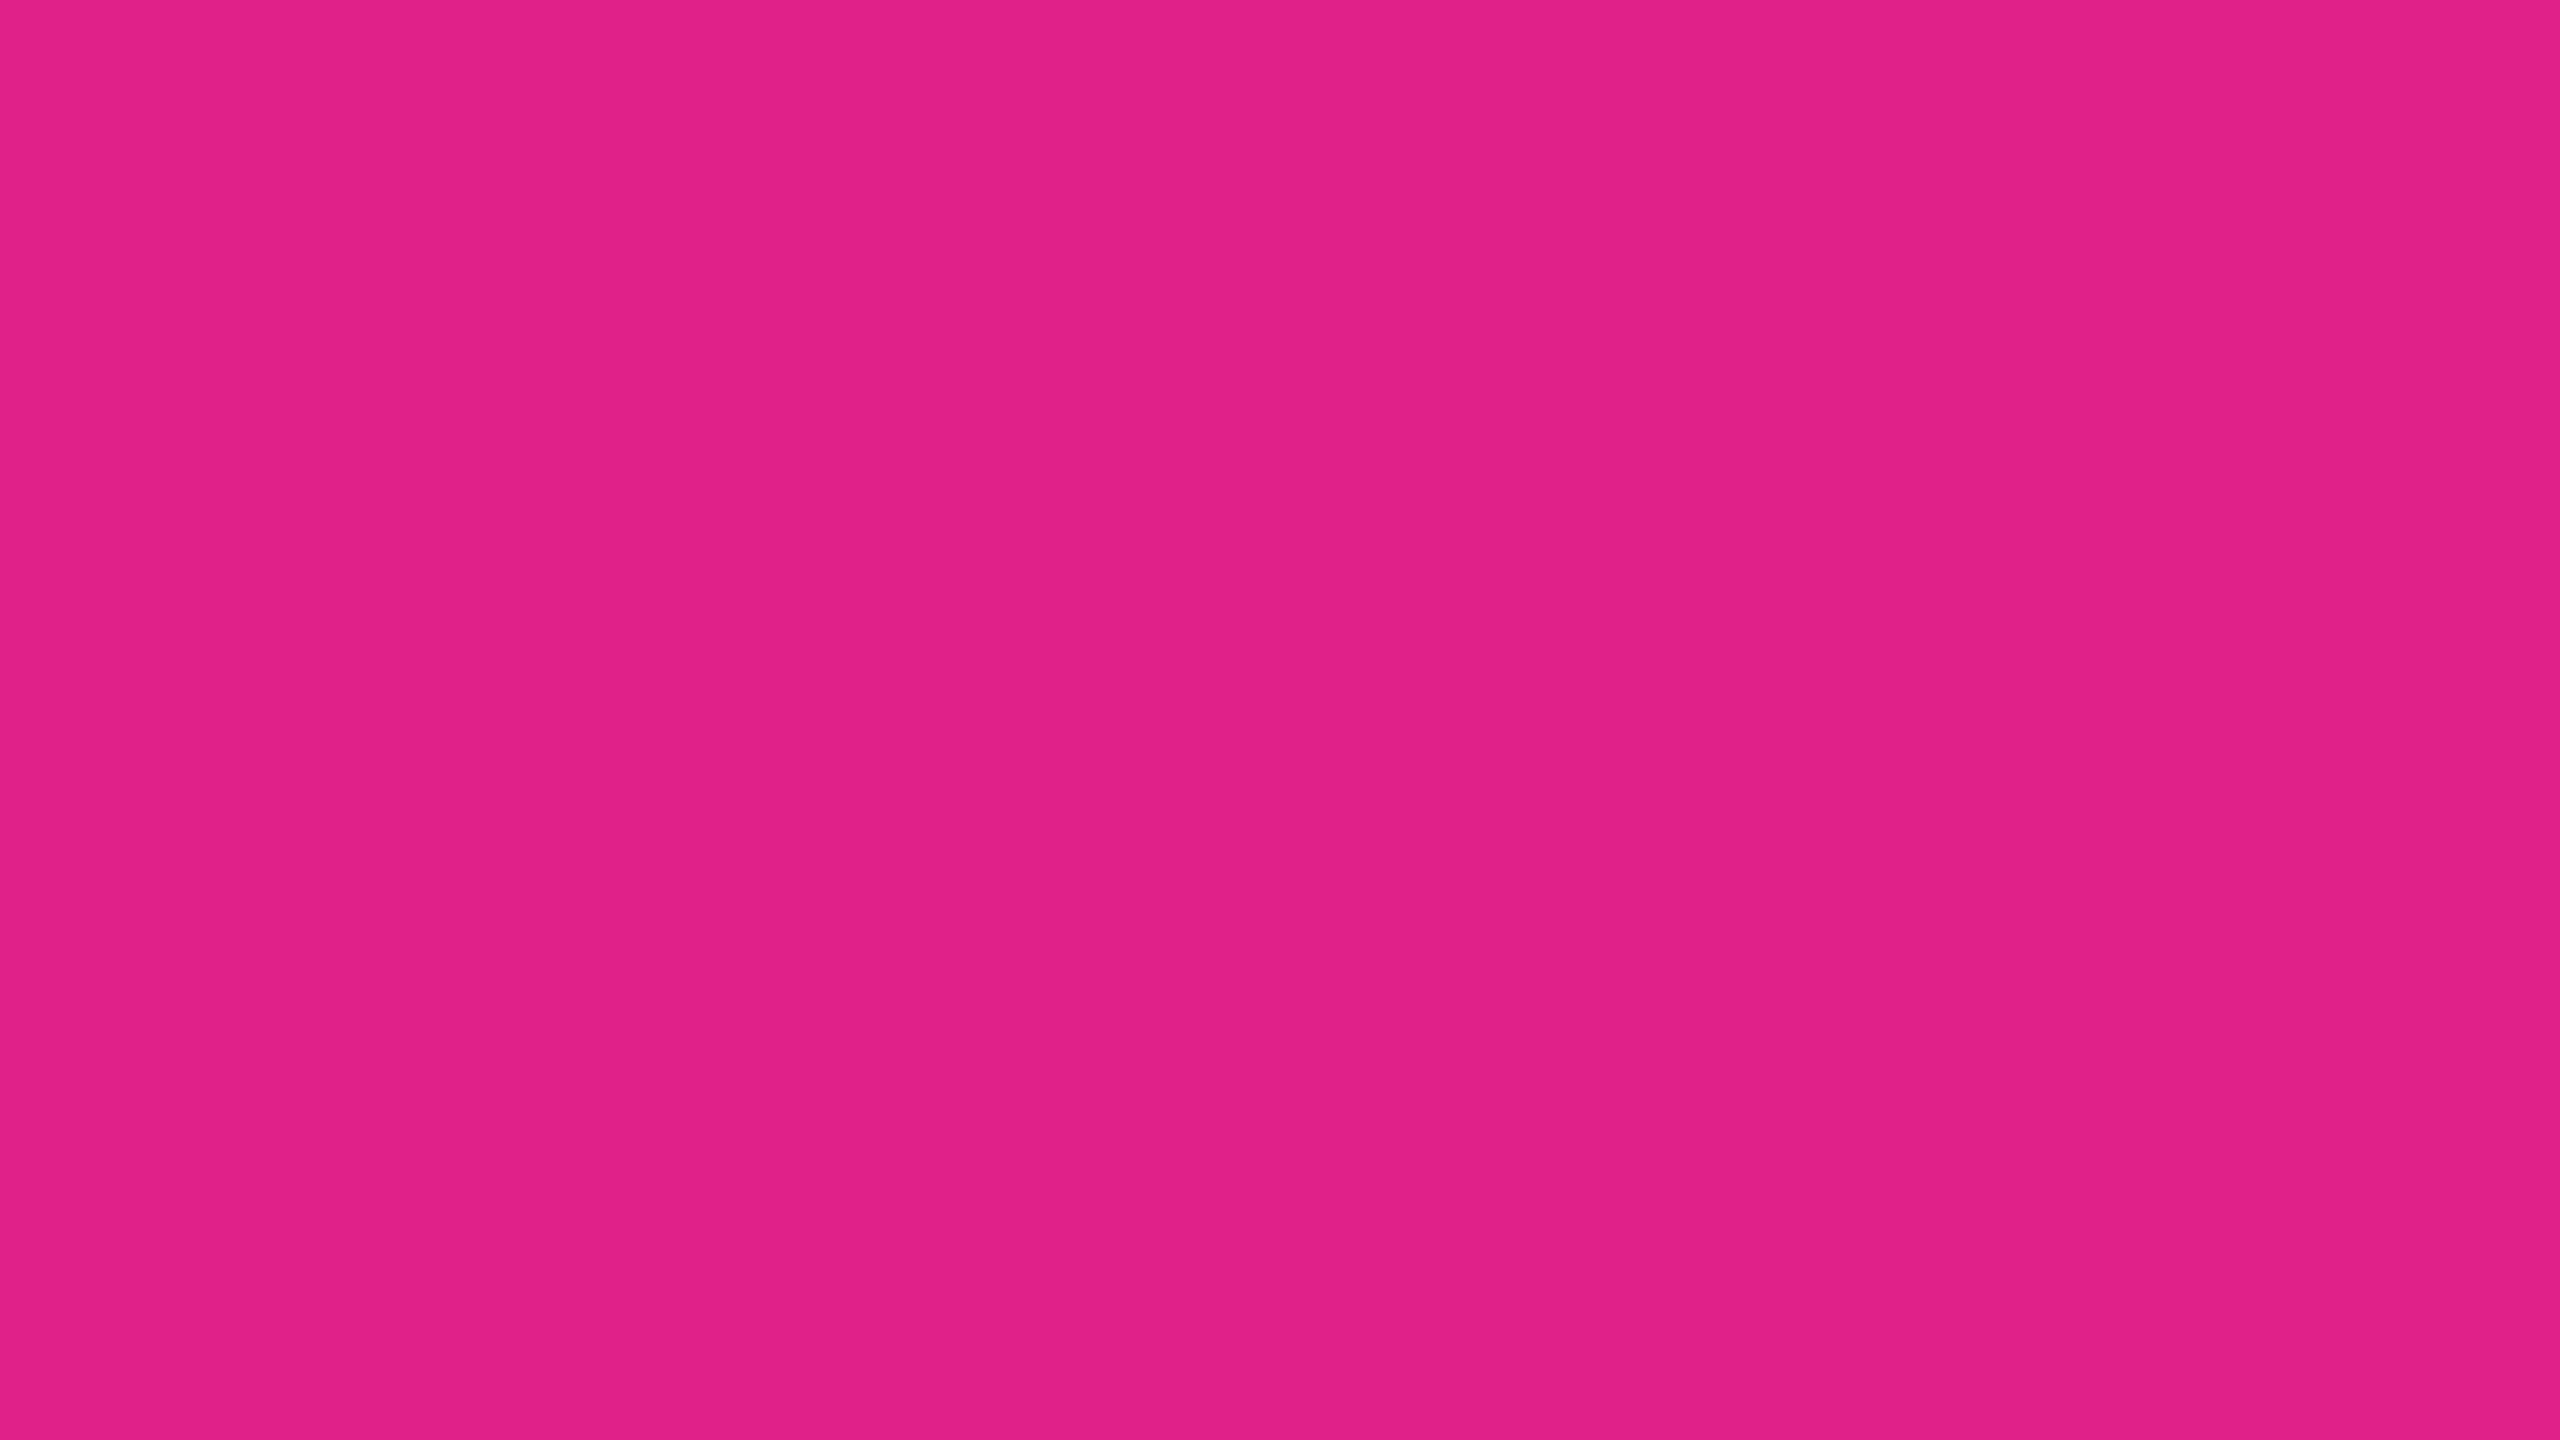 2560x1440 Barbie Pink Solid Color Background